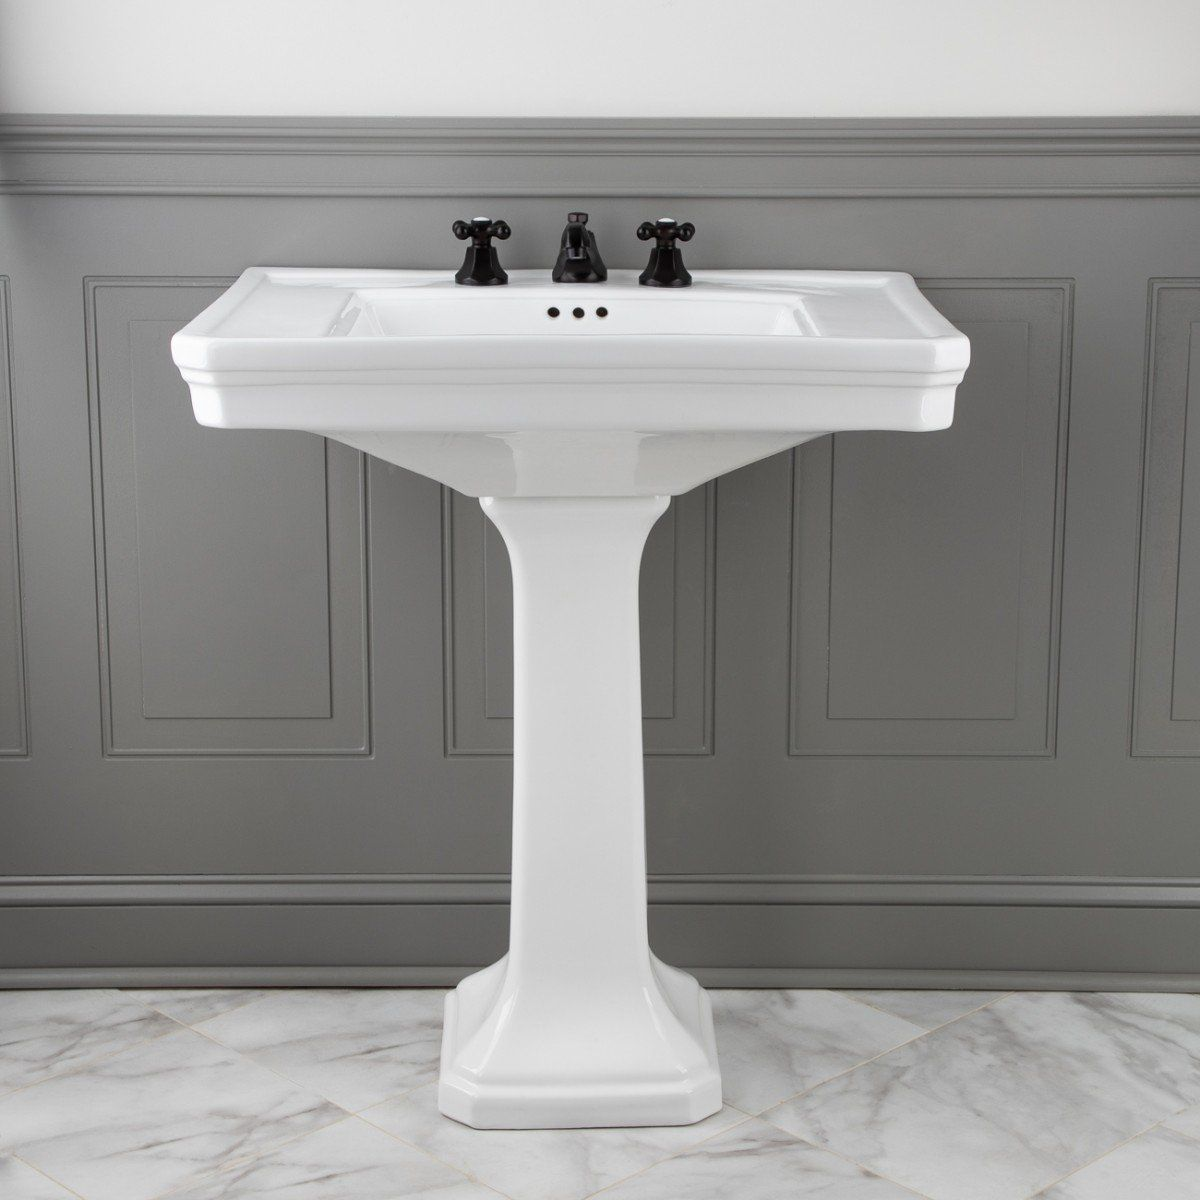 30 Inch Pedestal Sink Pedestal Sink Pedestal Sink Bathroom